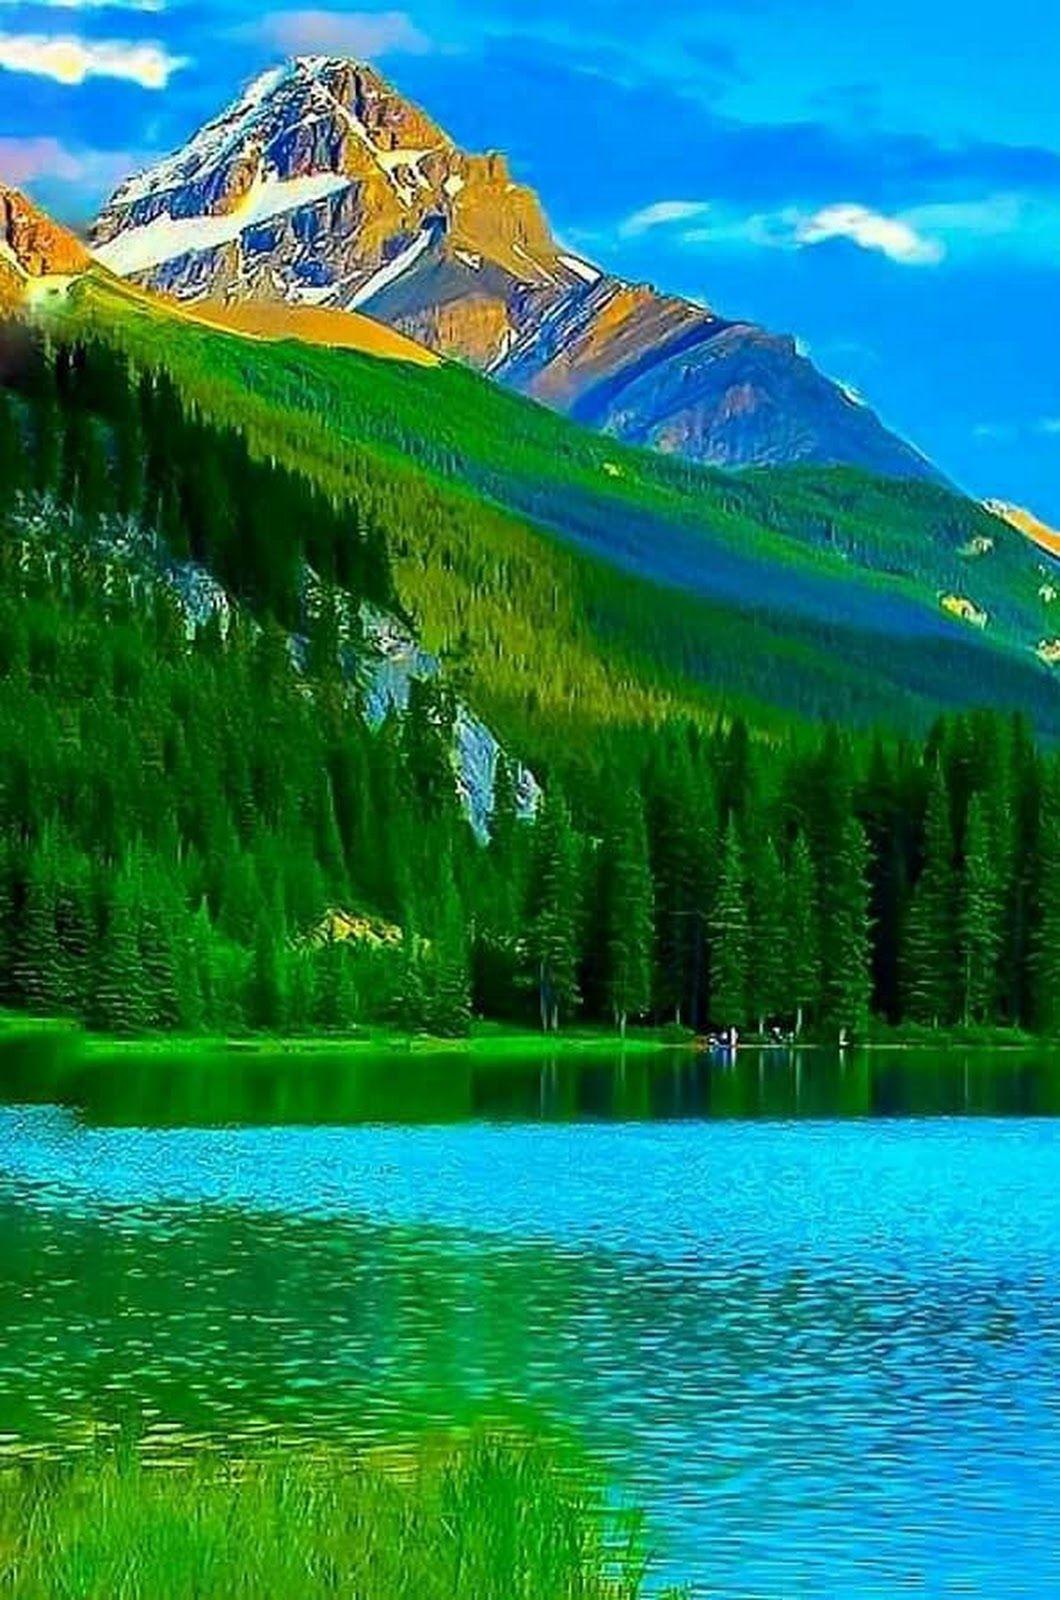 ɢood Morɴiɴɢ Dear ғrieɴdѕ Beautiful Nature Beautiful Nature Wallpaper Beautiful Landscapes